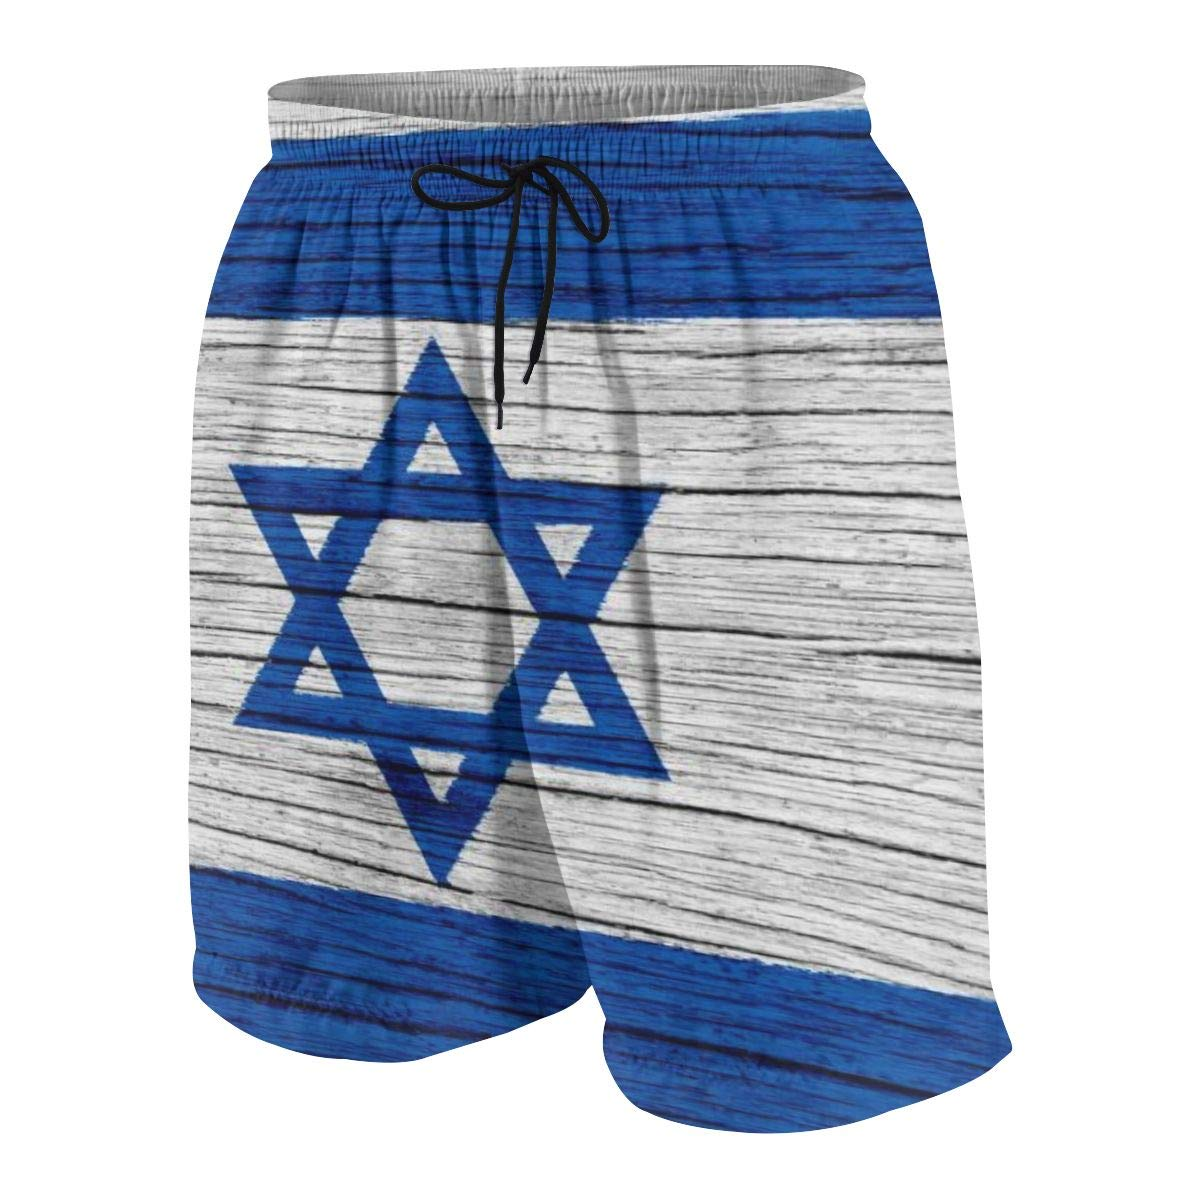 HFSST Israel Wooden Texture Israeli Flag Teen Swim Trunks Bathing Suit Shorts Board Beach